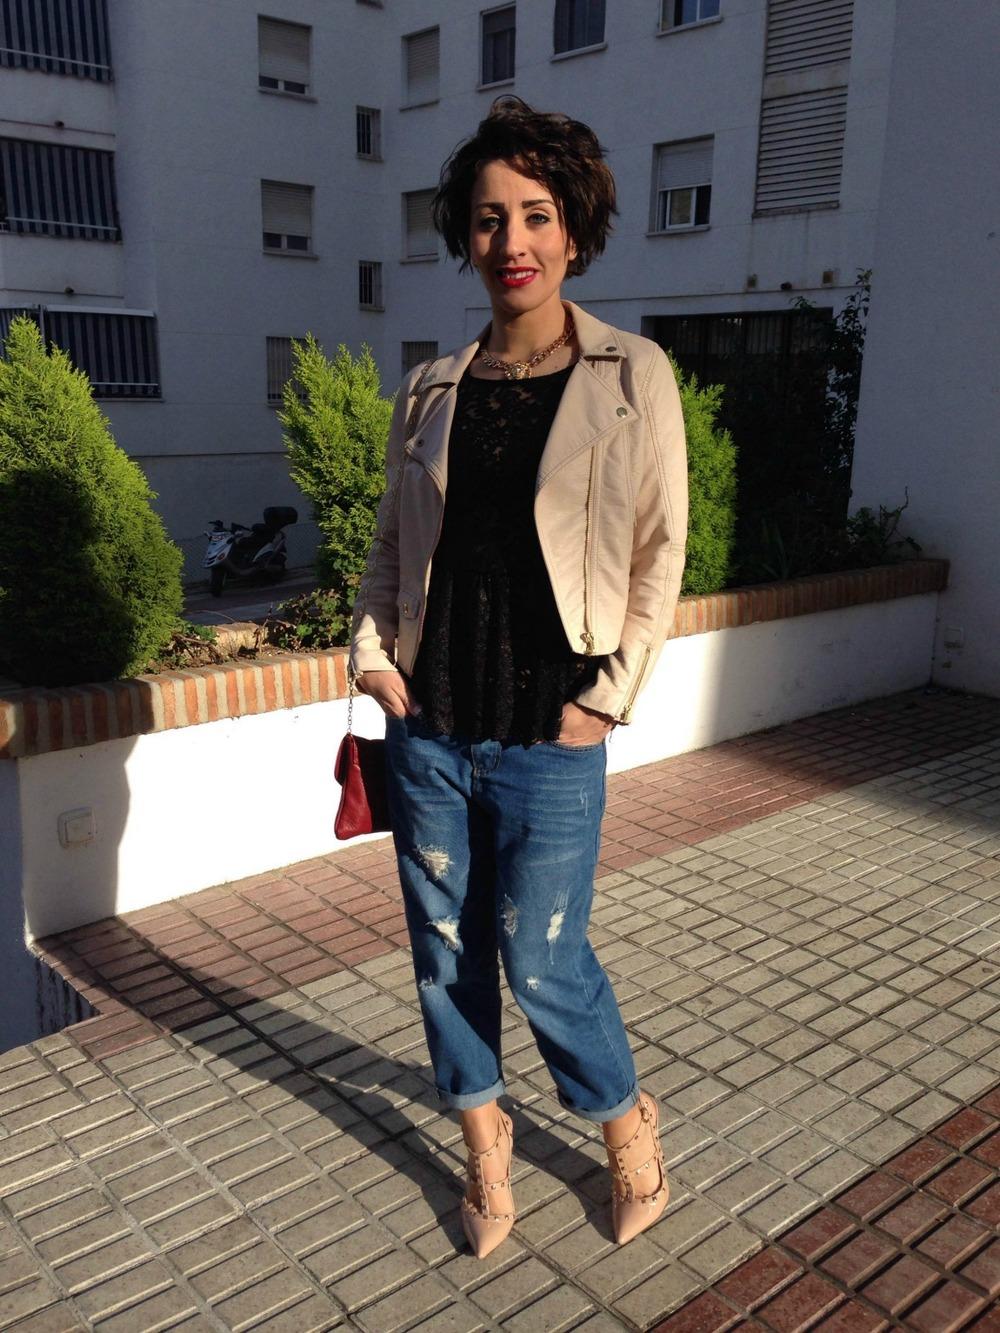 photo+(2).jpg